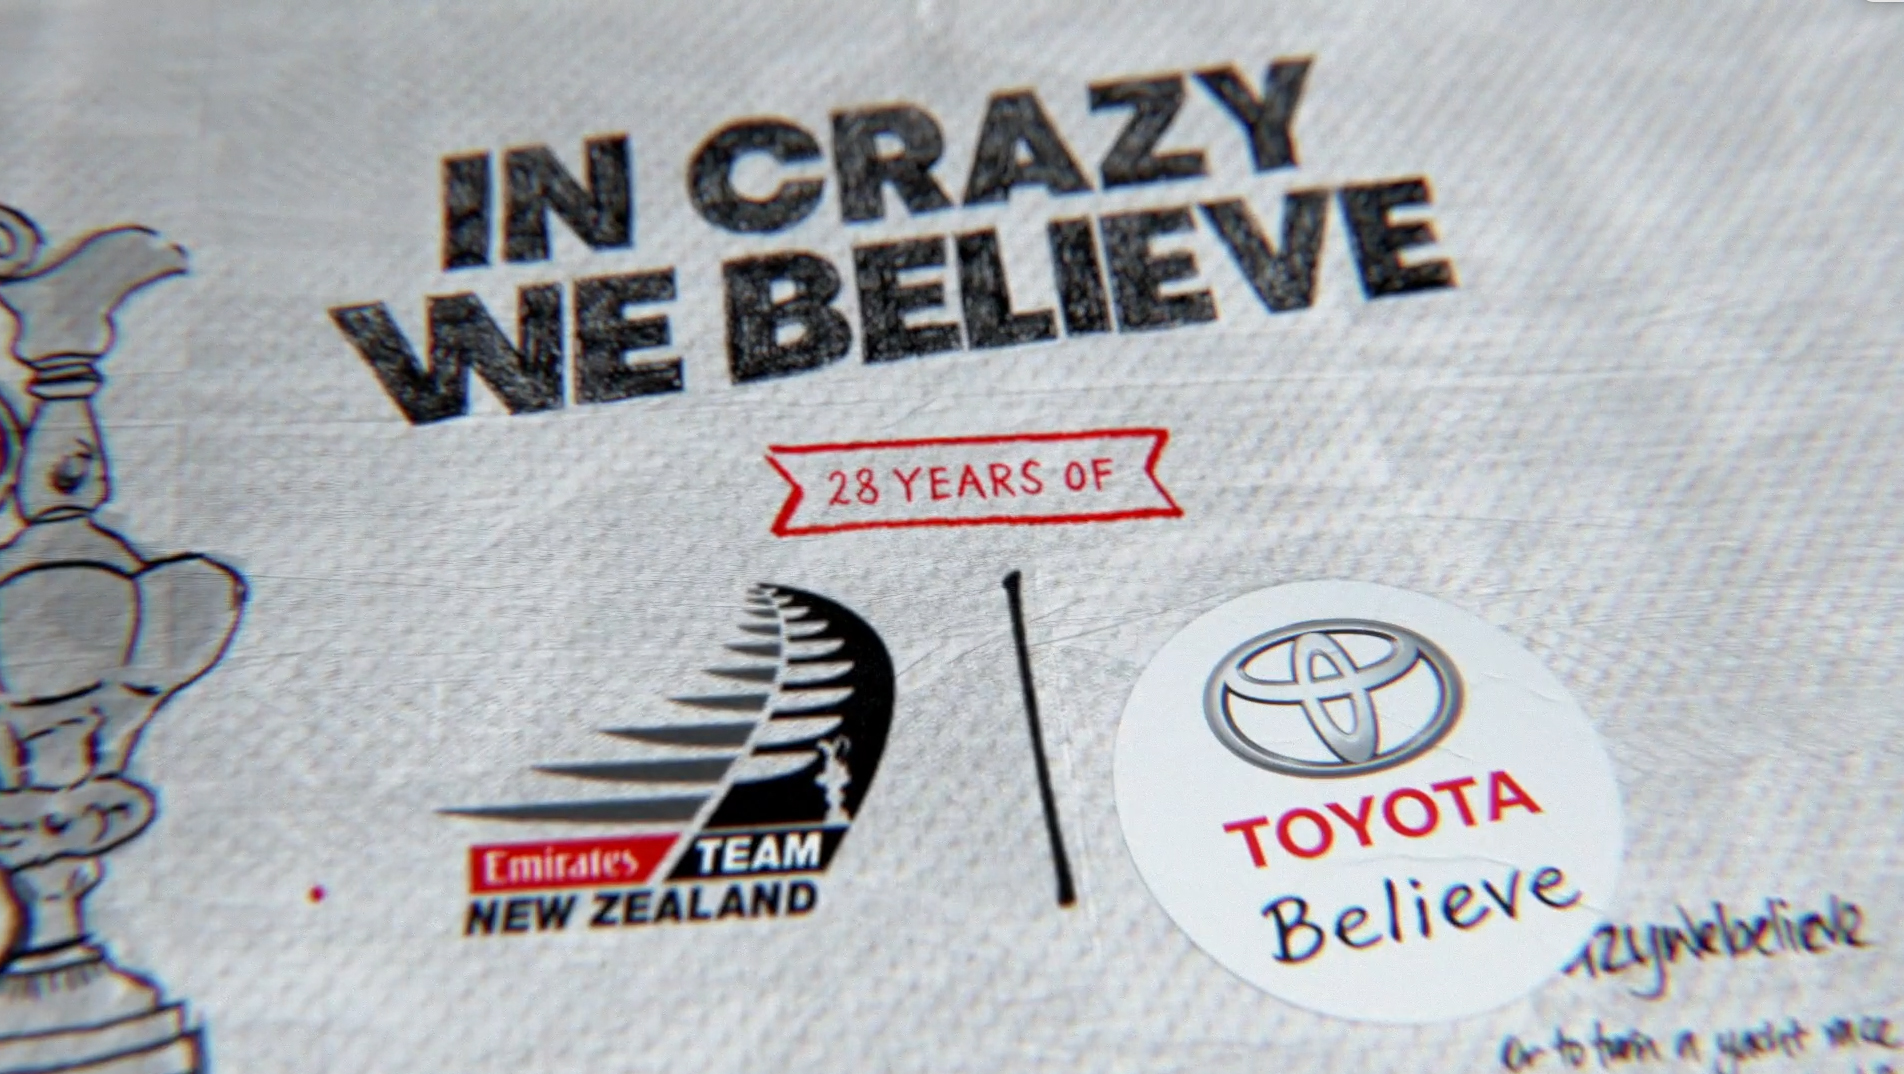 """In Crazy We Believe"": Toyota celebrates 28-year support of Emirates Team New Zealand in latest campaign via Saatchi & Saatchi"